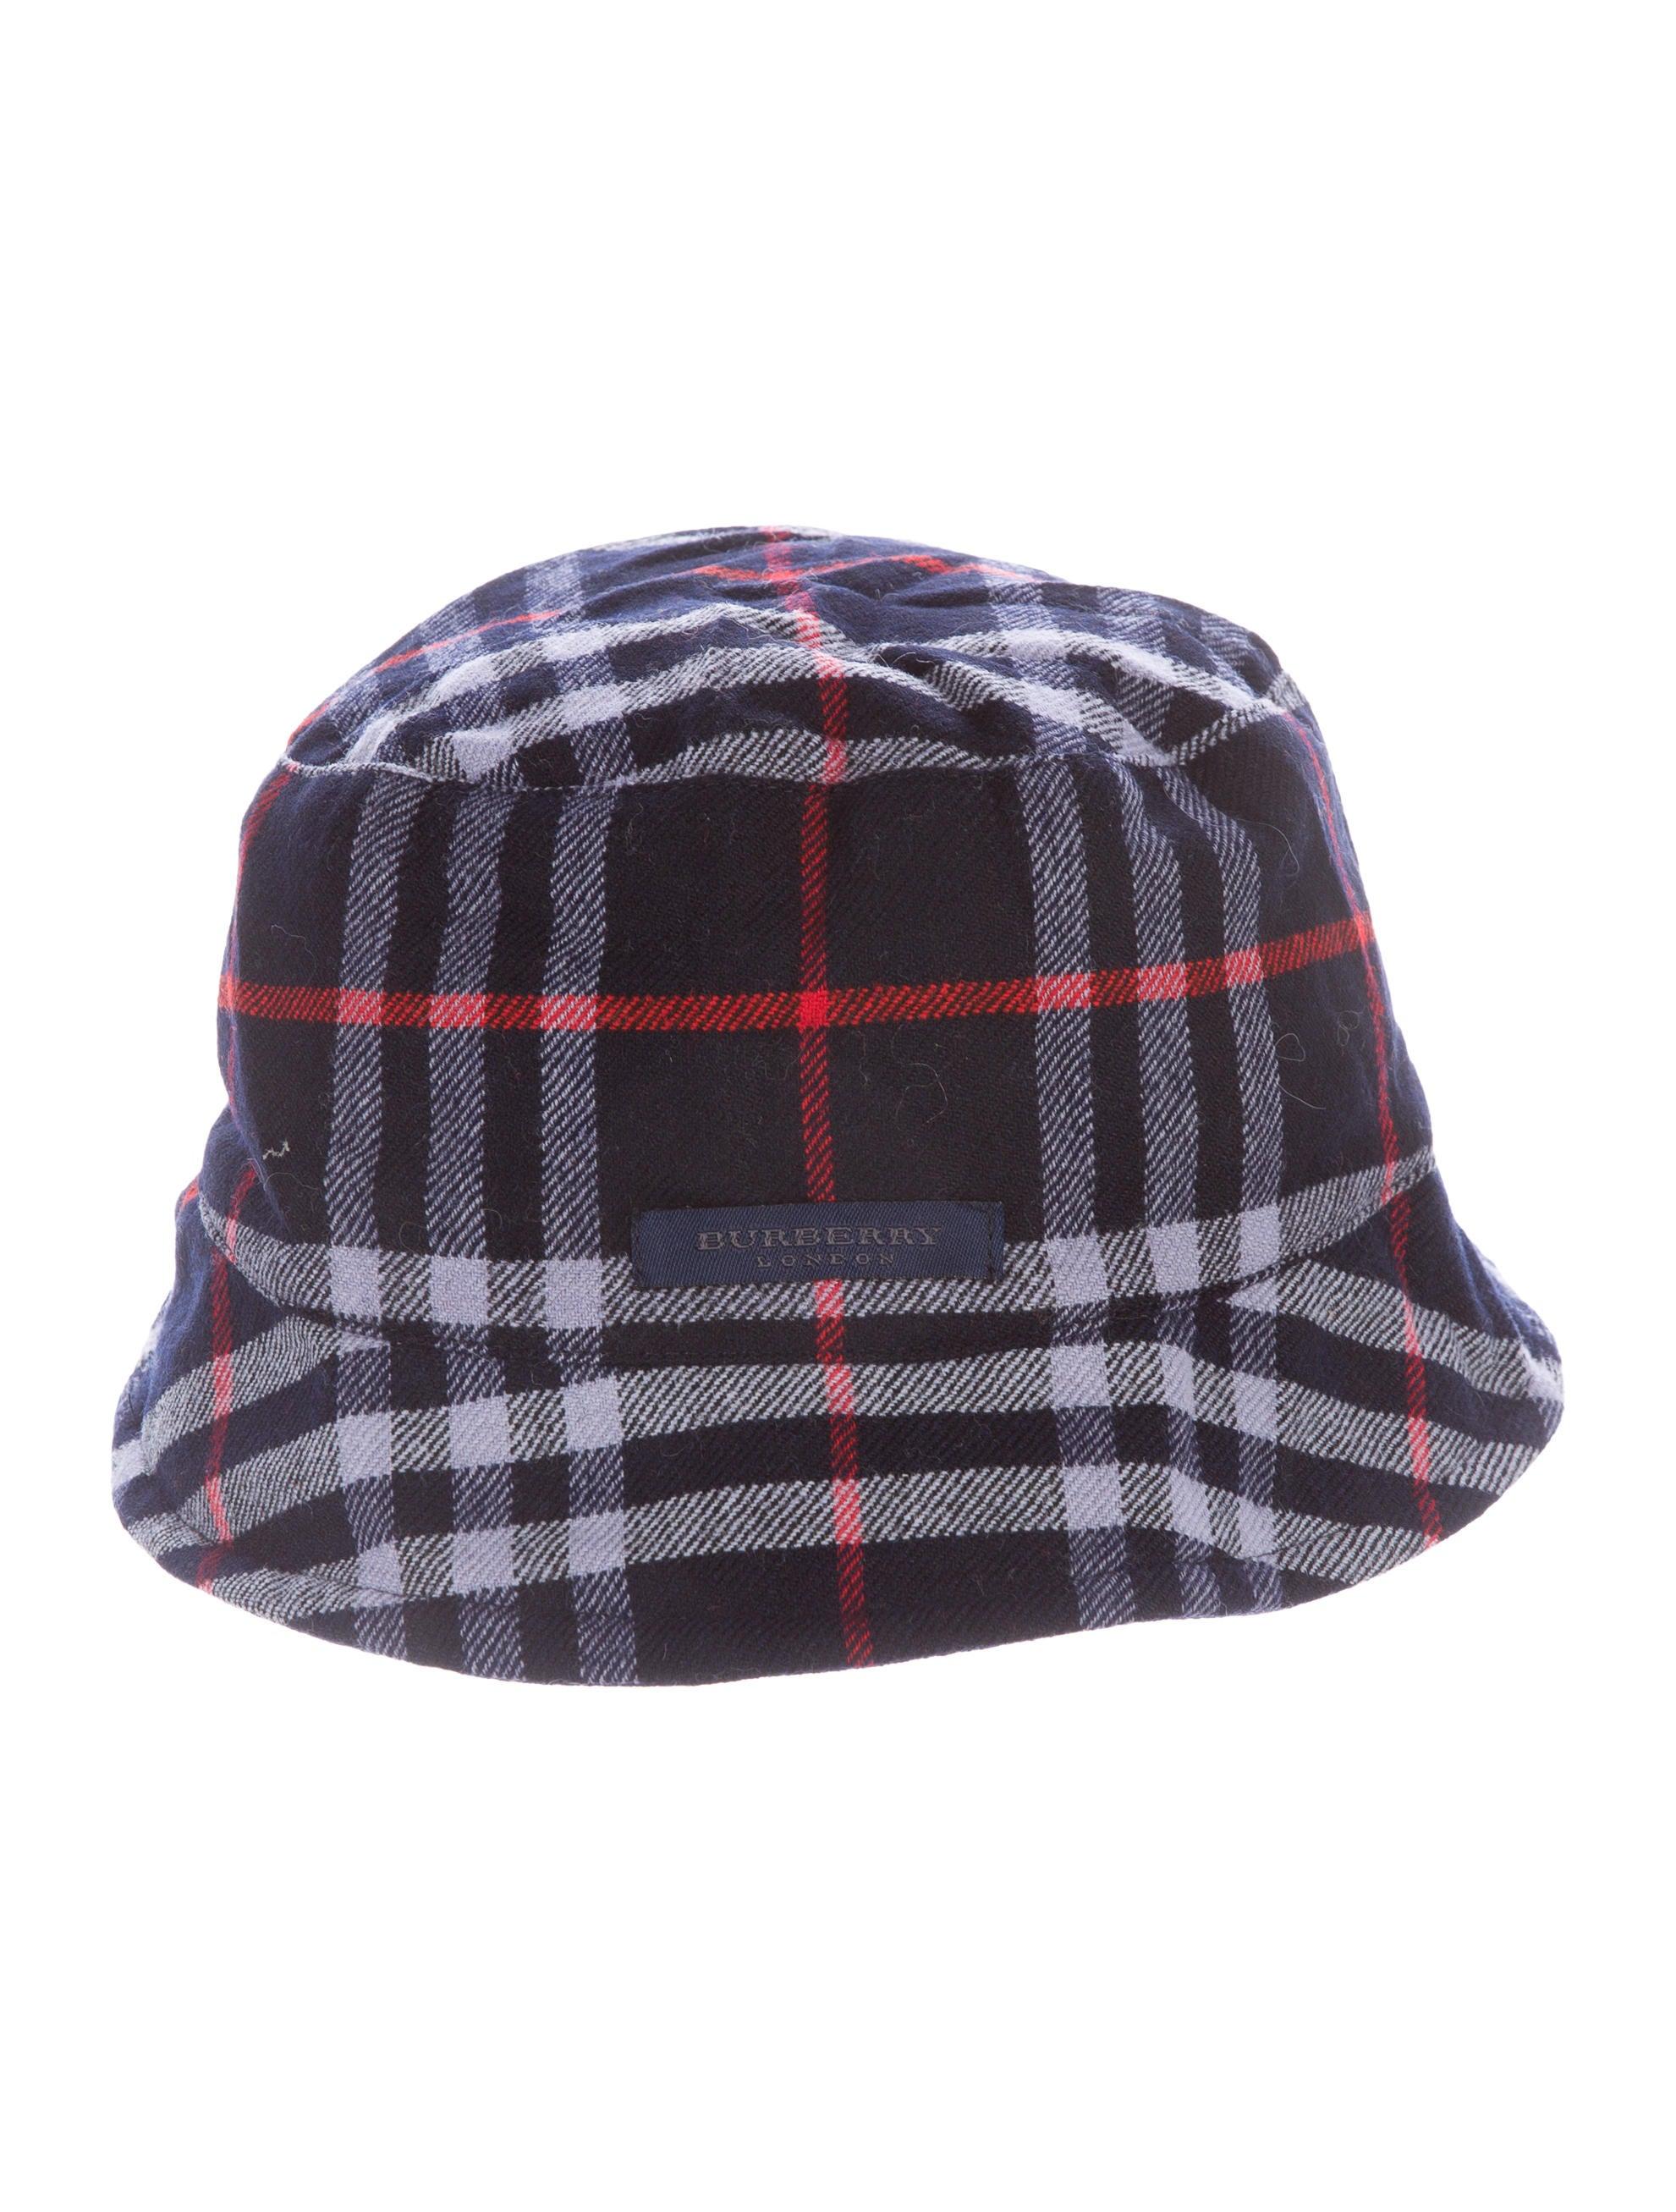 Burberry Boys' Reversible Bucket Hat w/ Tags BUR67255 ...